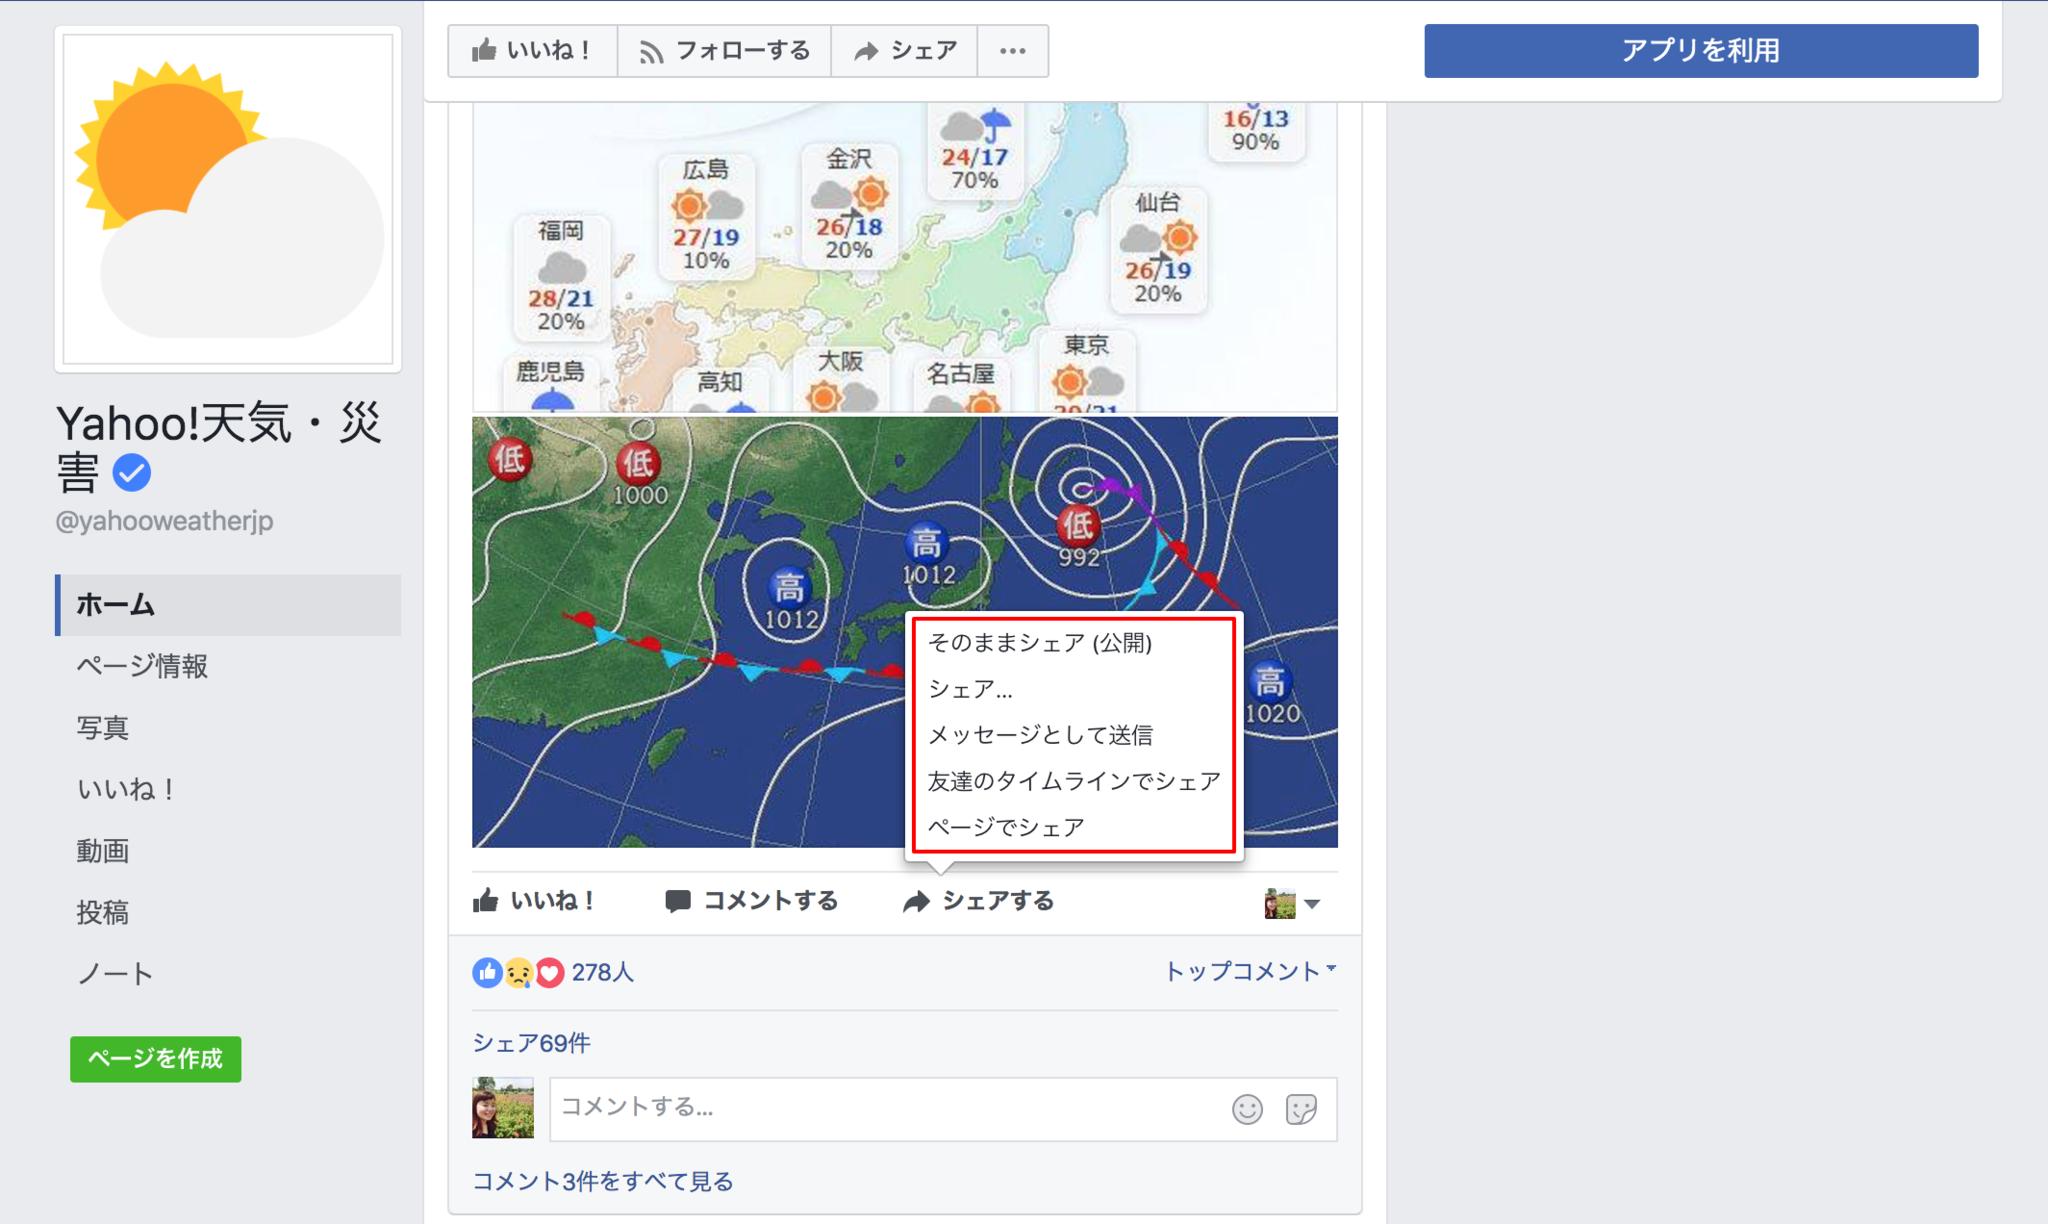 Yahoo_天気・災害___ホーム_(1).png